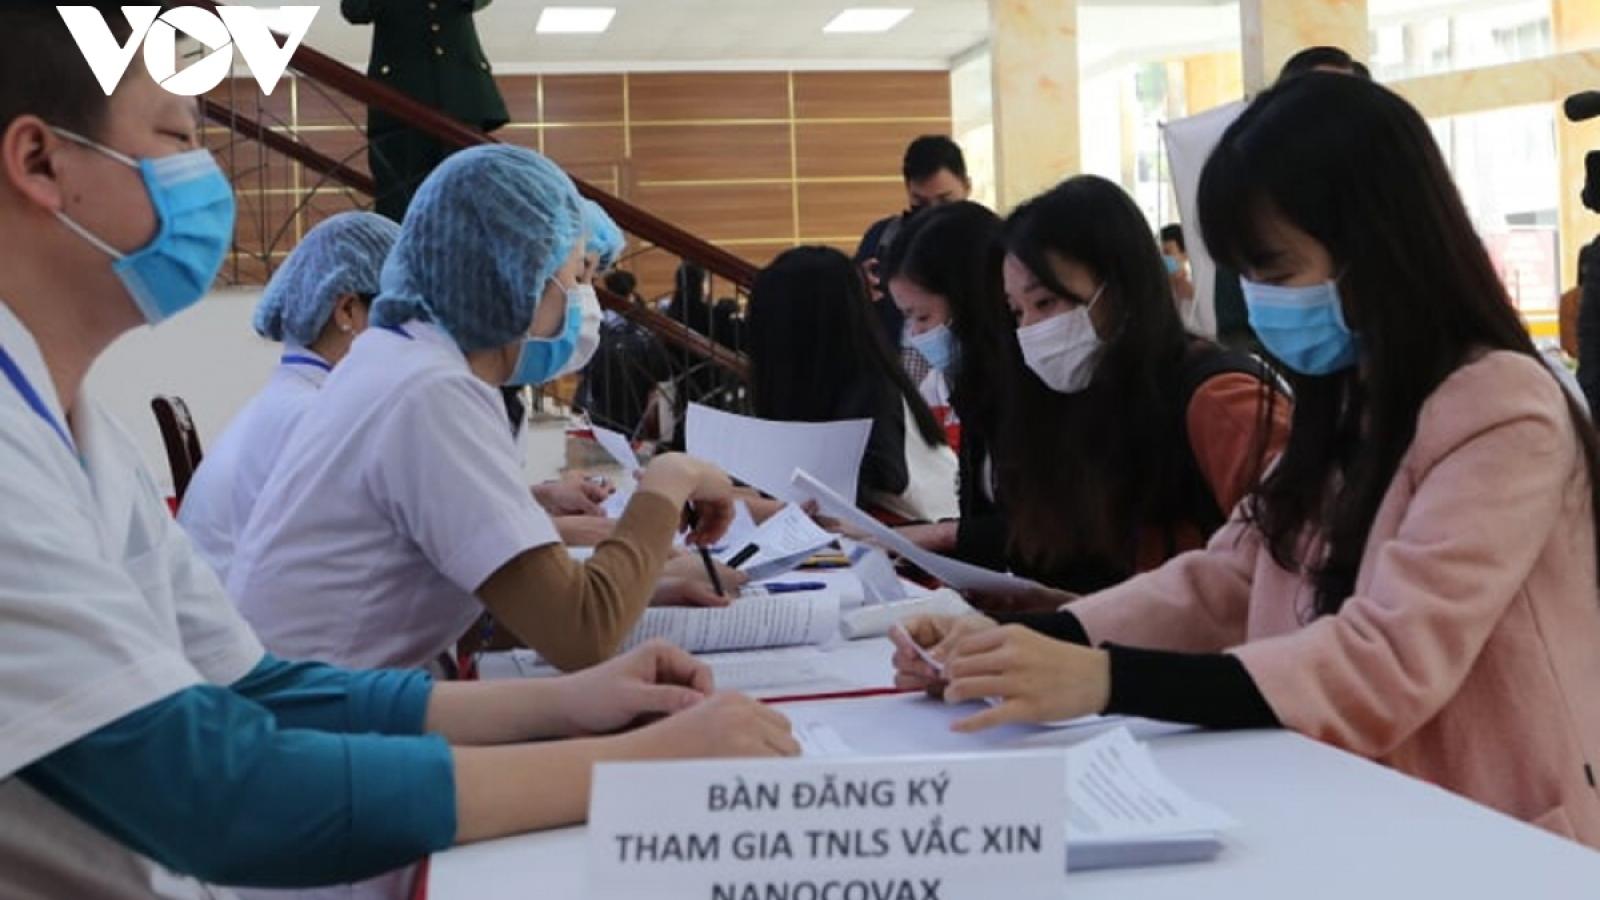 Volunteers register to participate in COVID-19 vaccine trial